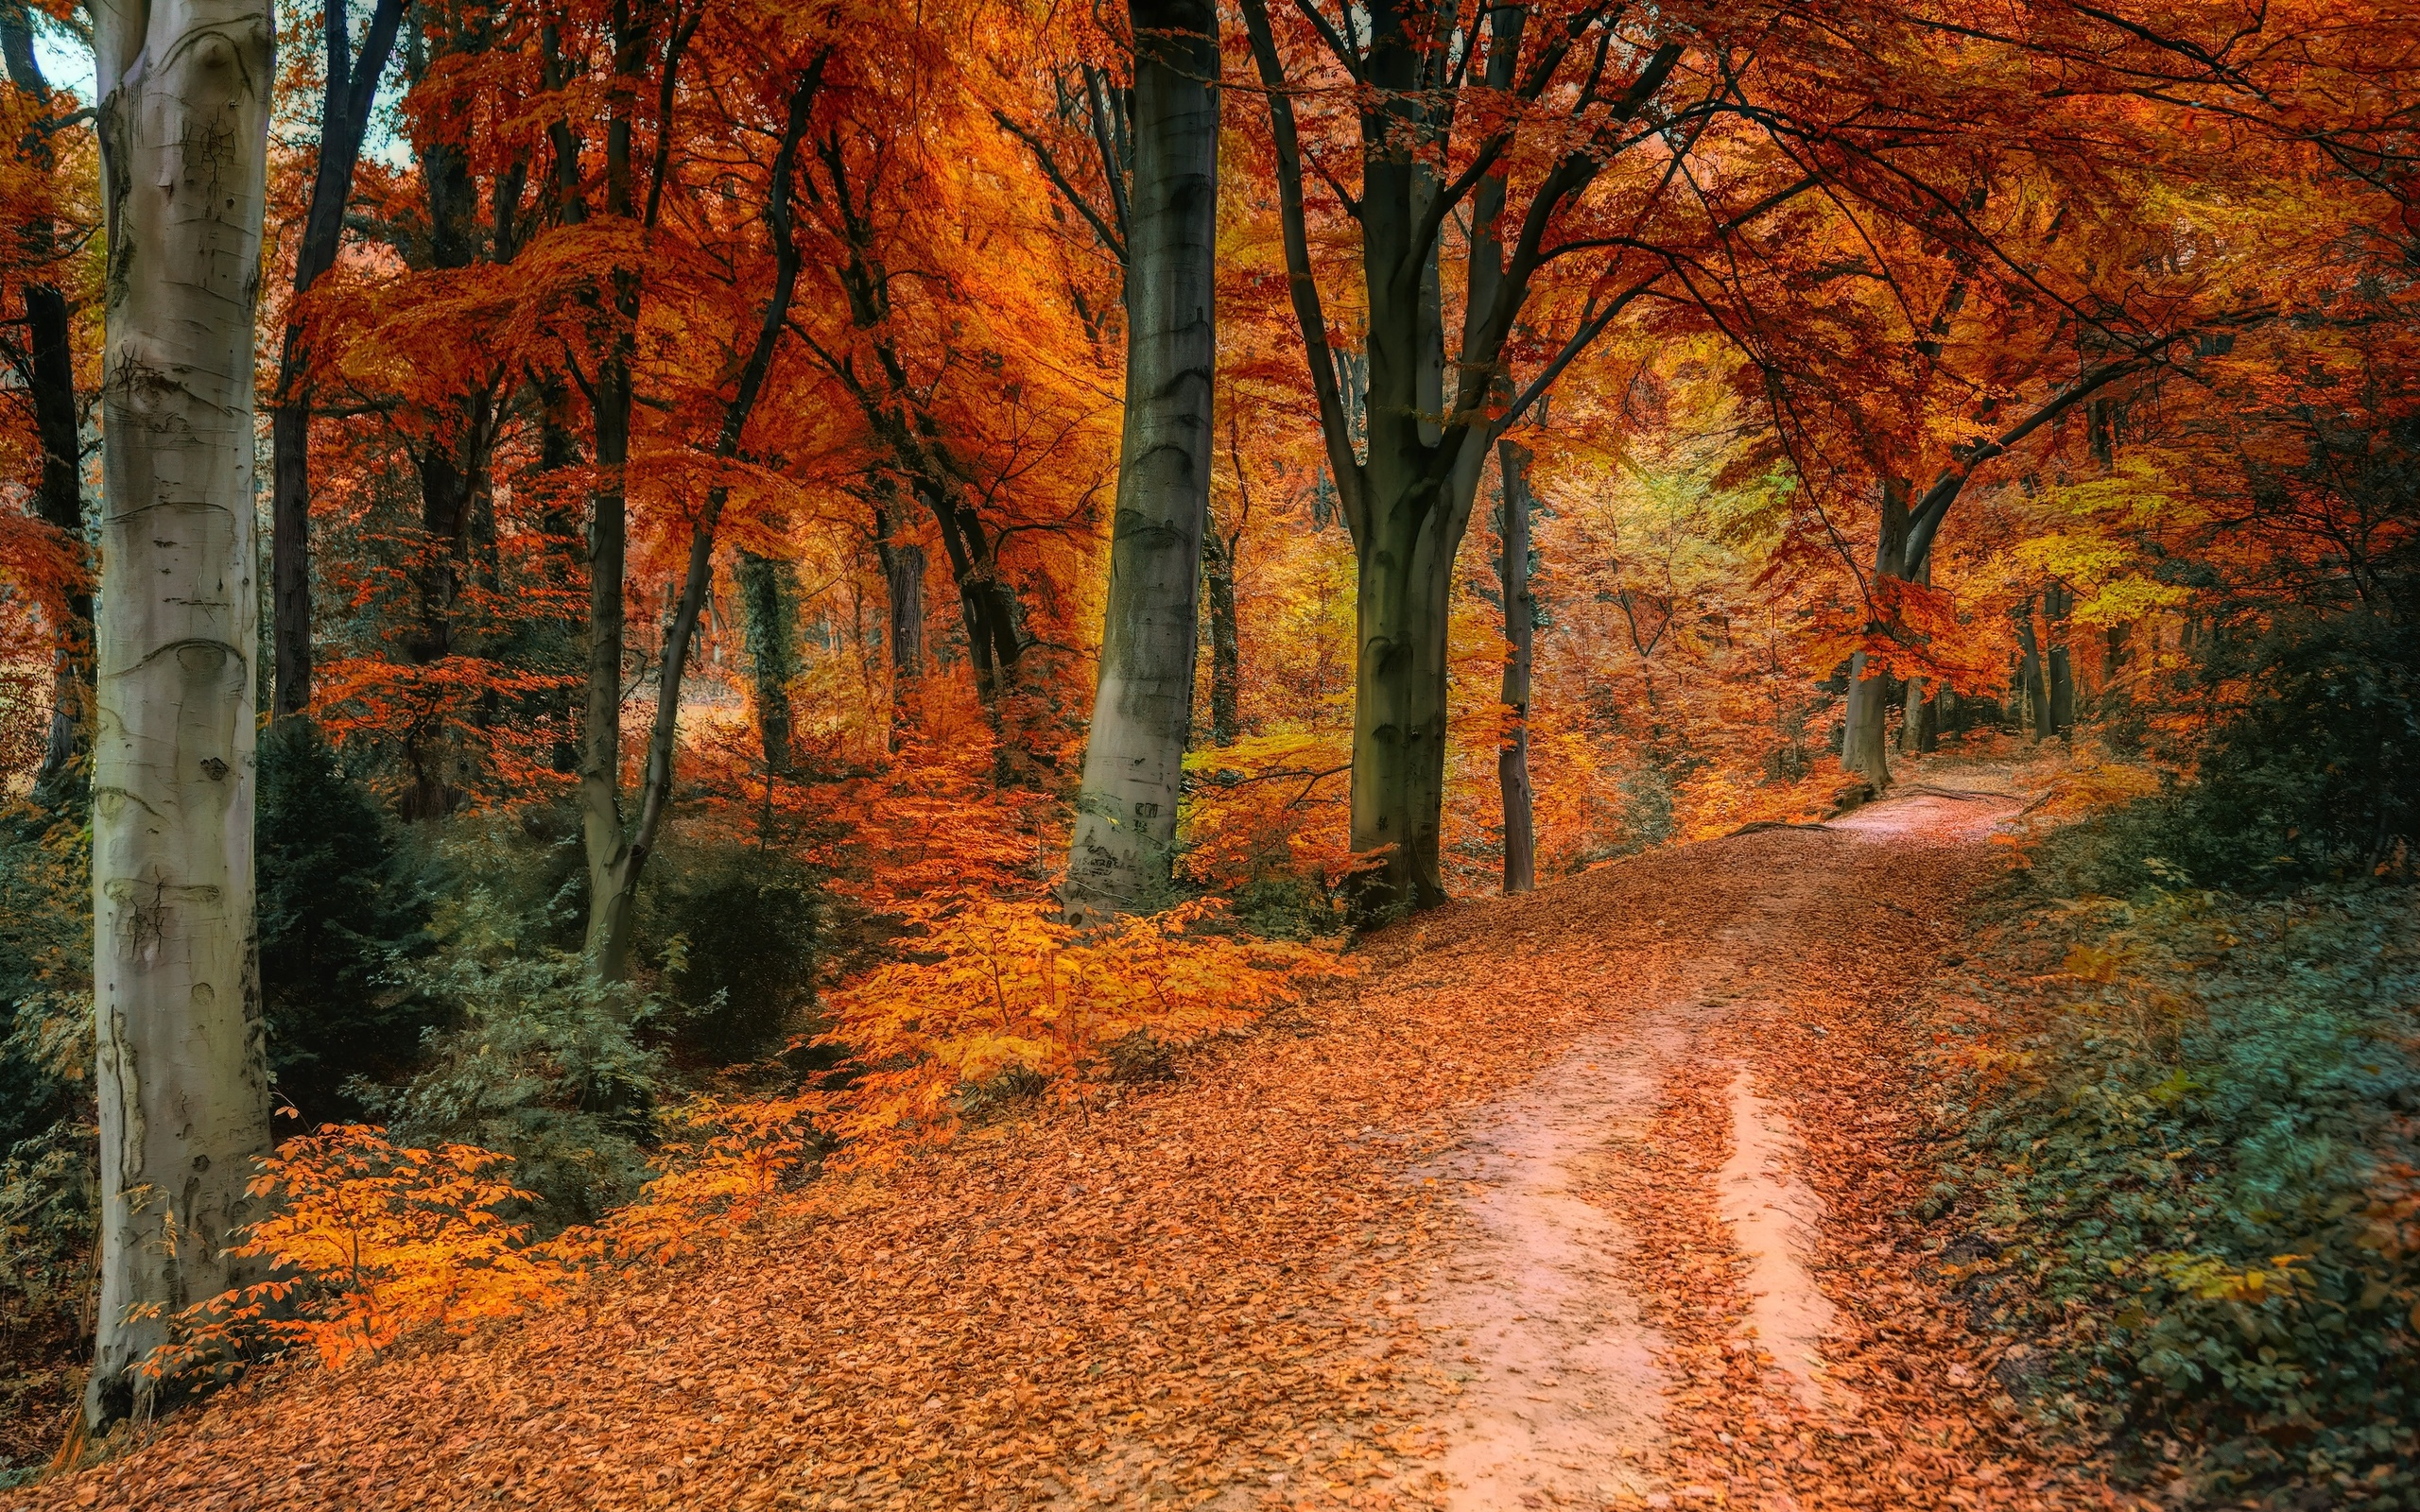 дорога, осень, лес, деревья, пейзаж, природа, парк